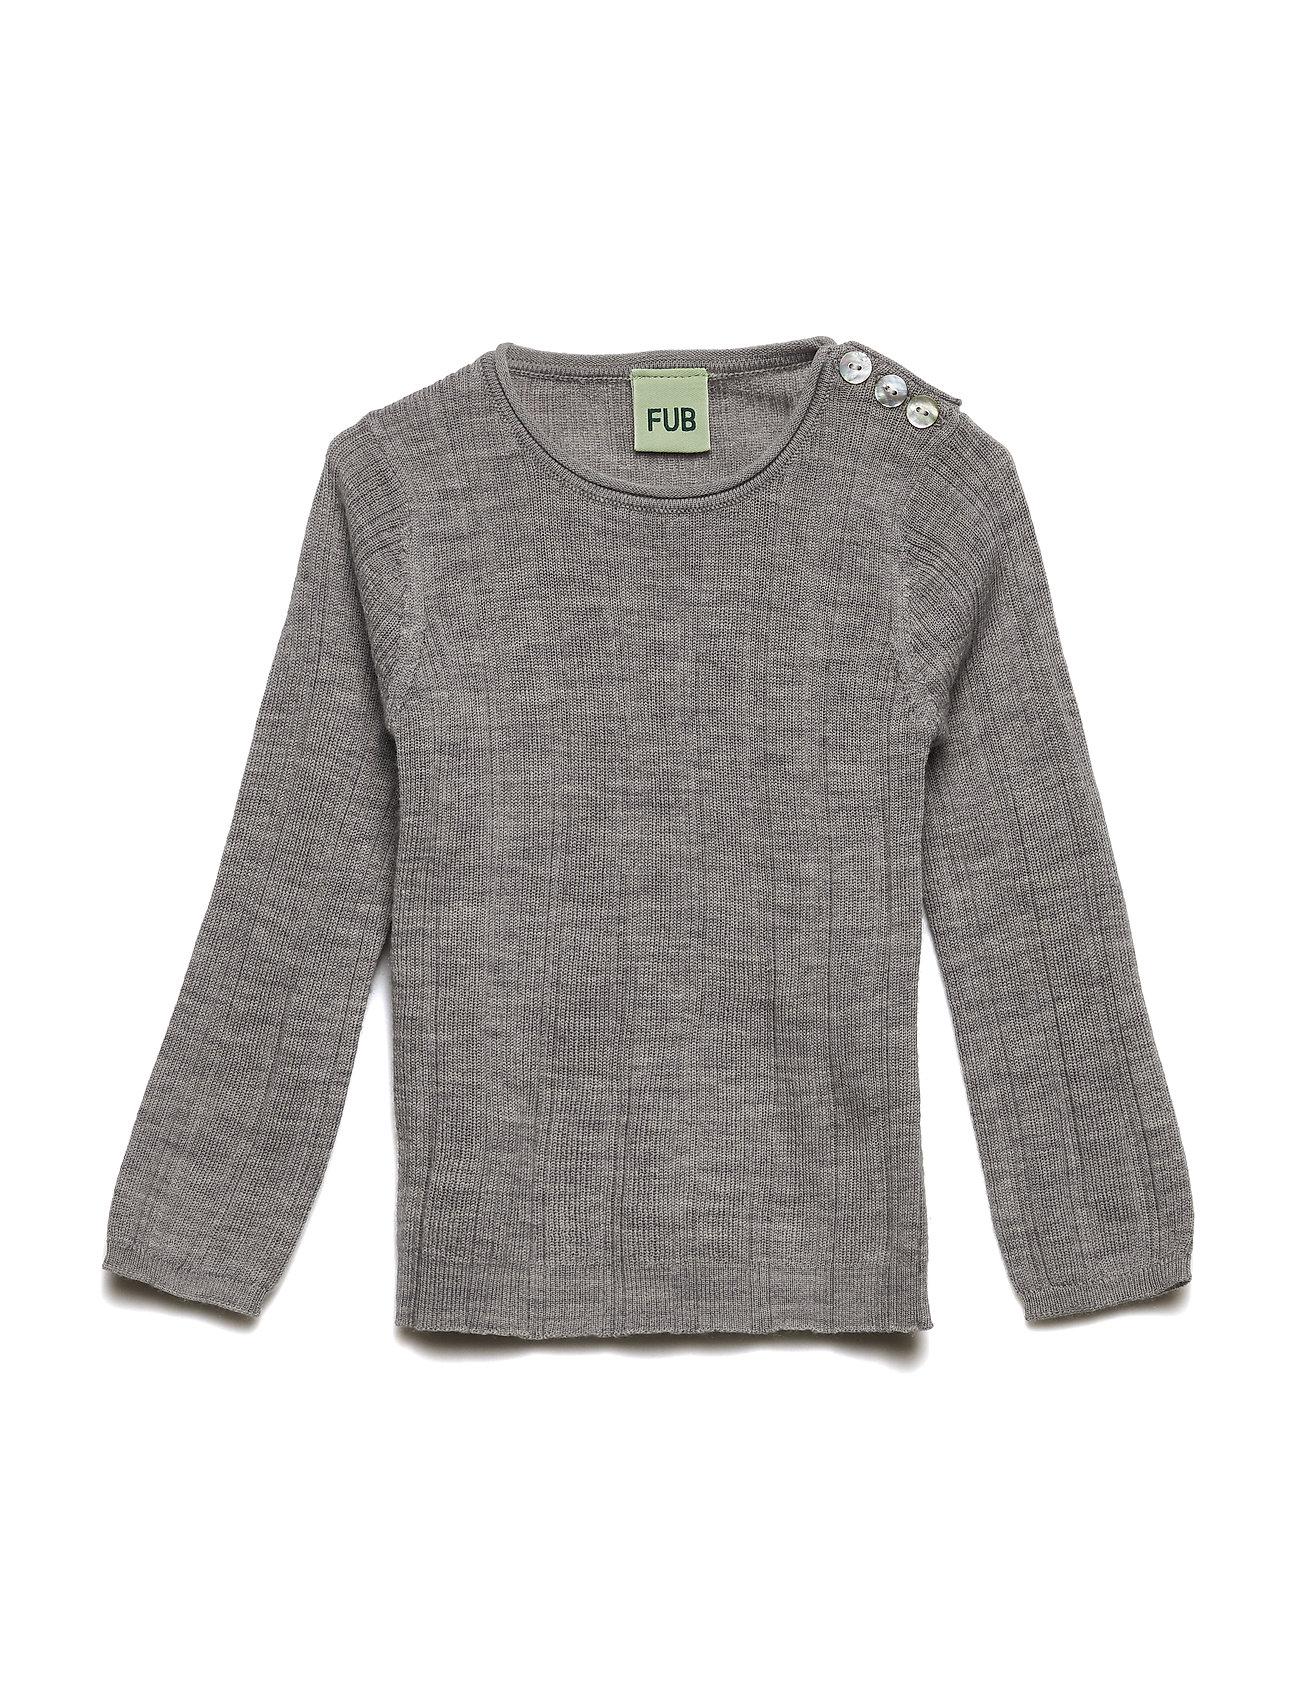 030311310108 Baby Rib Blouse (Light Grey) (£24.85) - FUB -